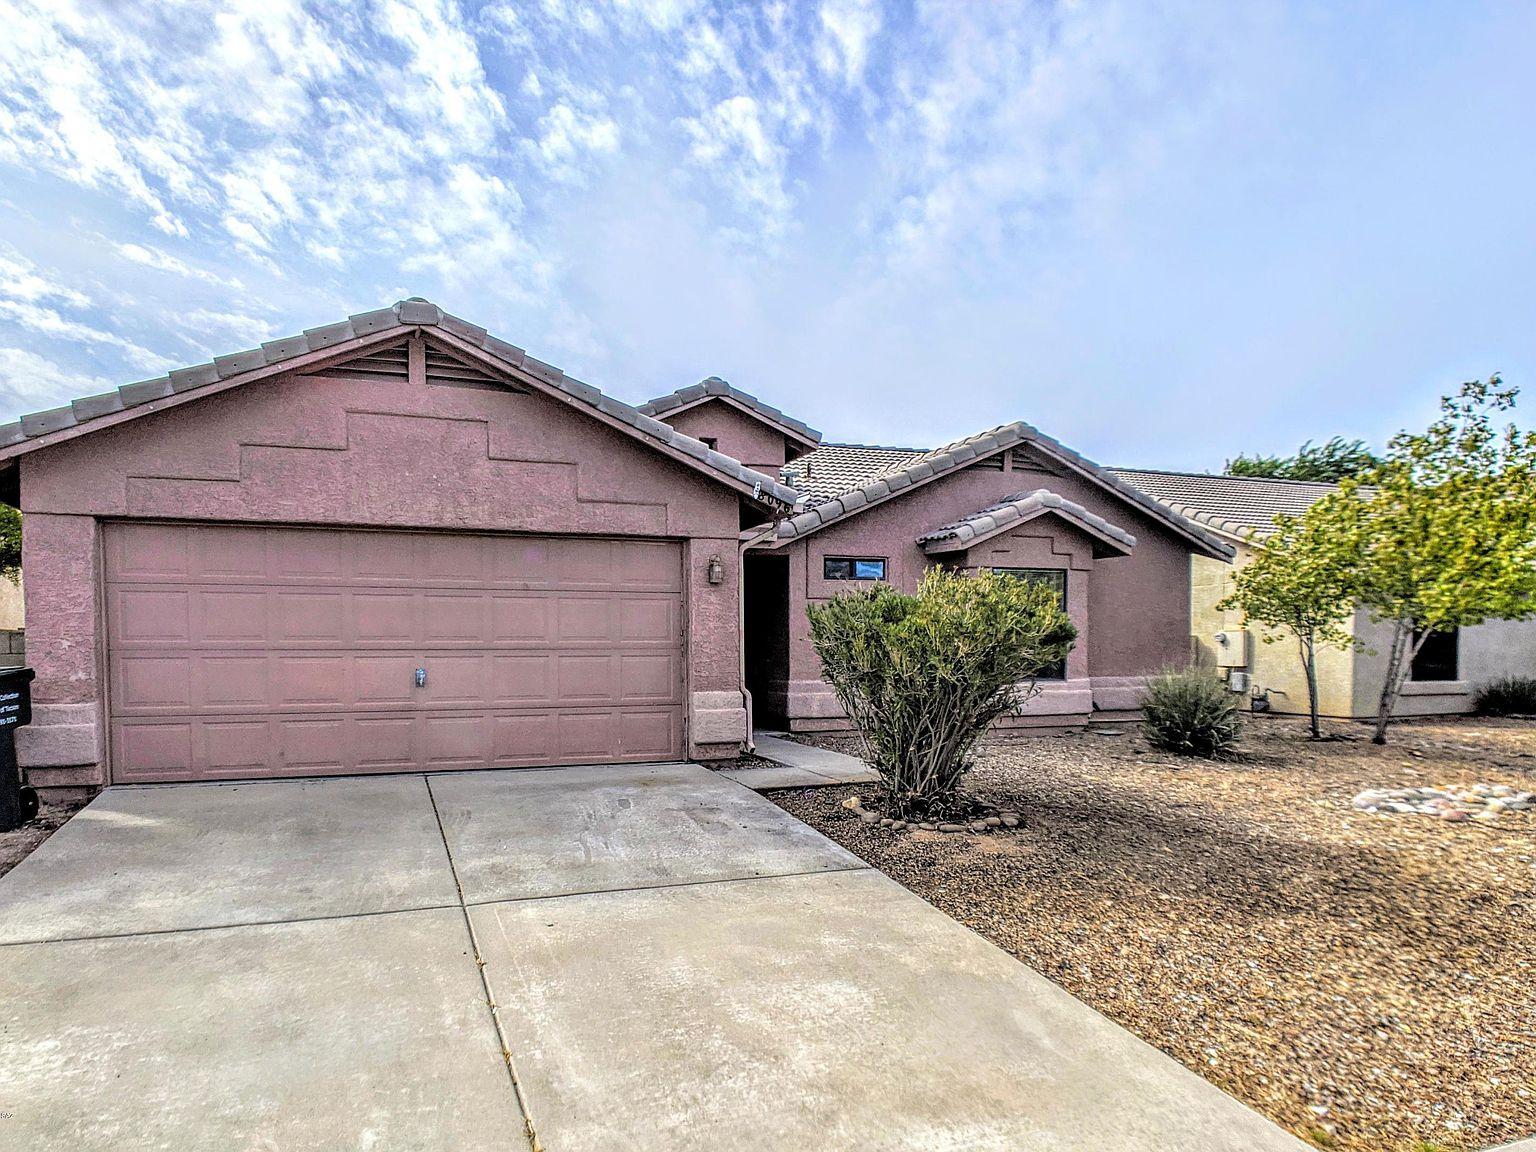 8096 S Carbury Way Tucson Az 85747 Zillow